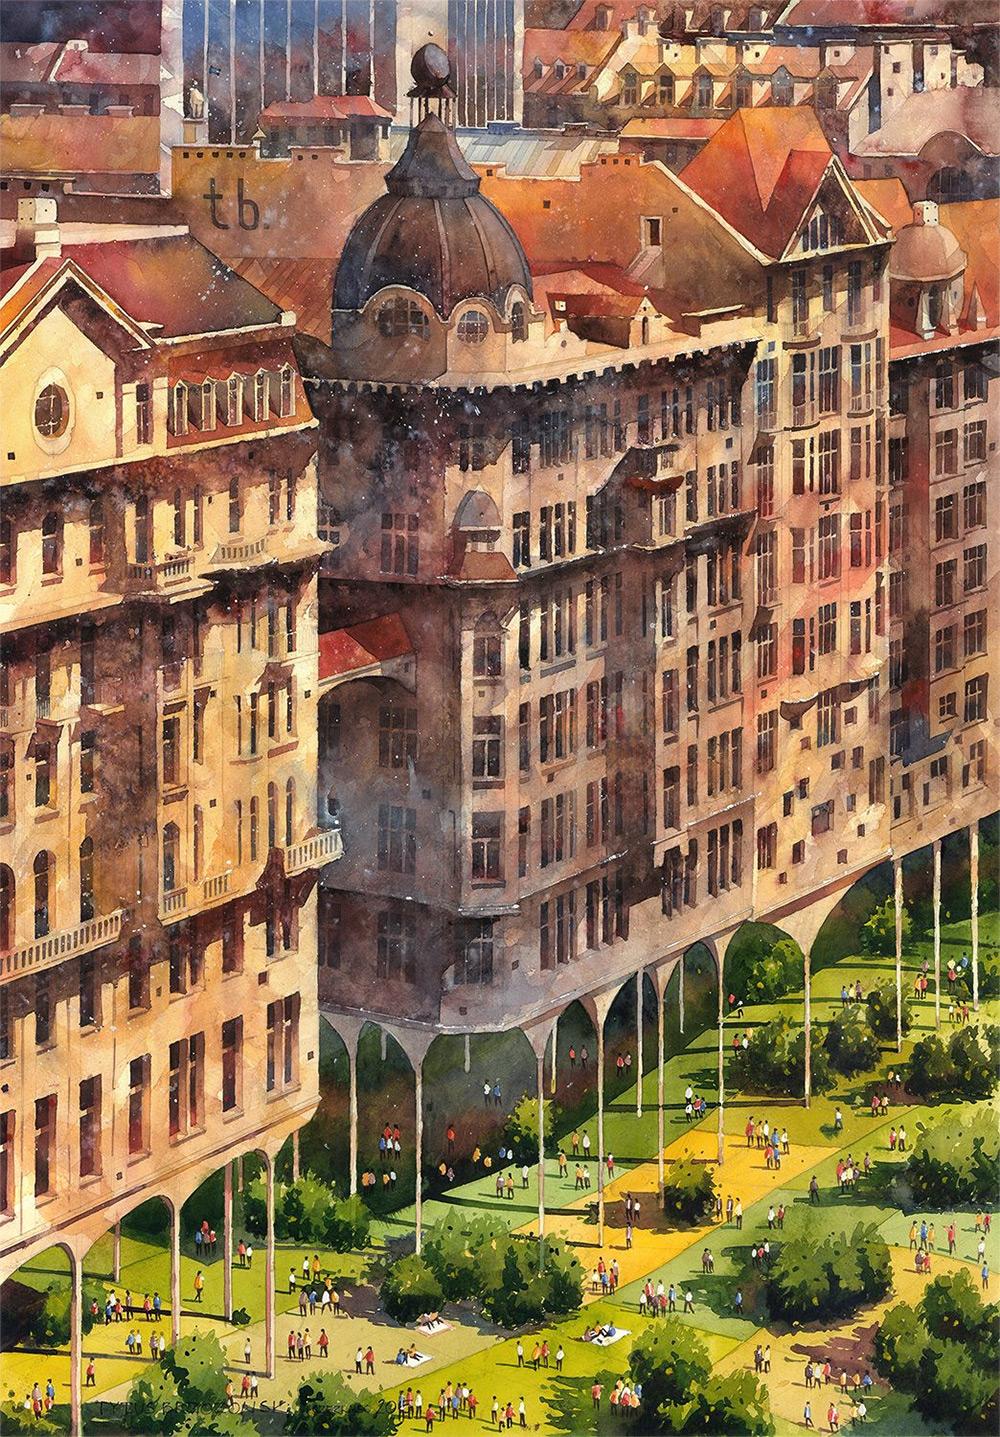 Архитектура Варшавы от Титуса Бжозовского